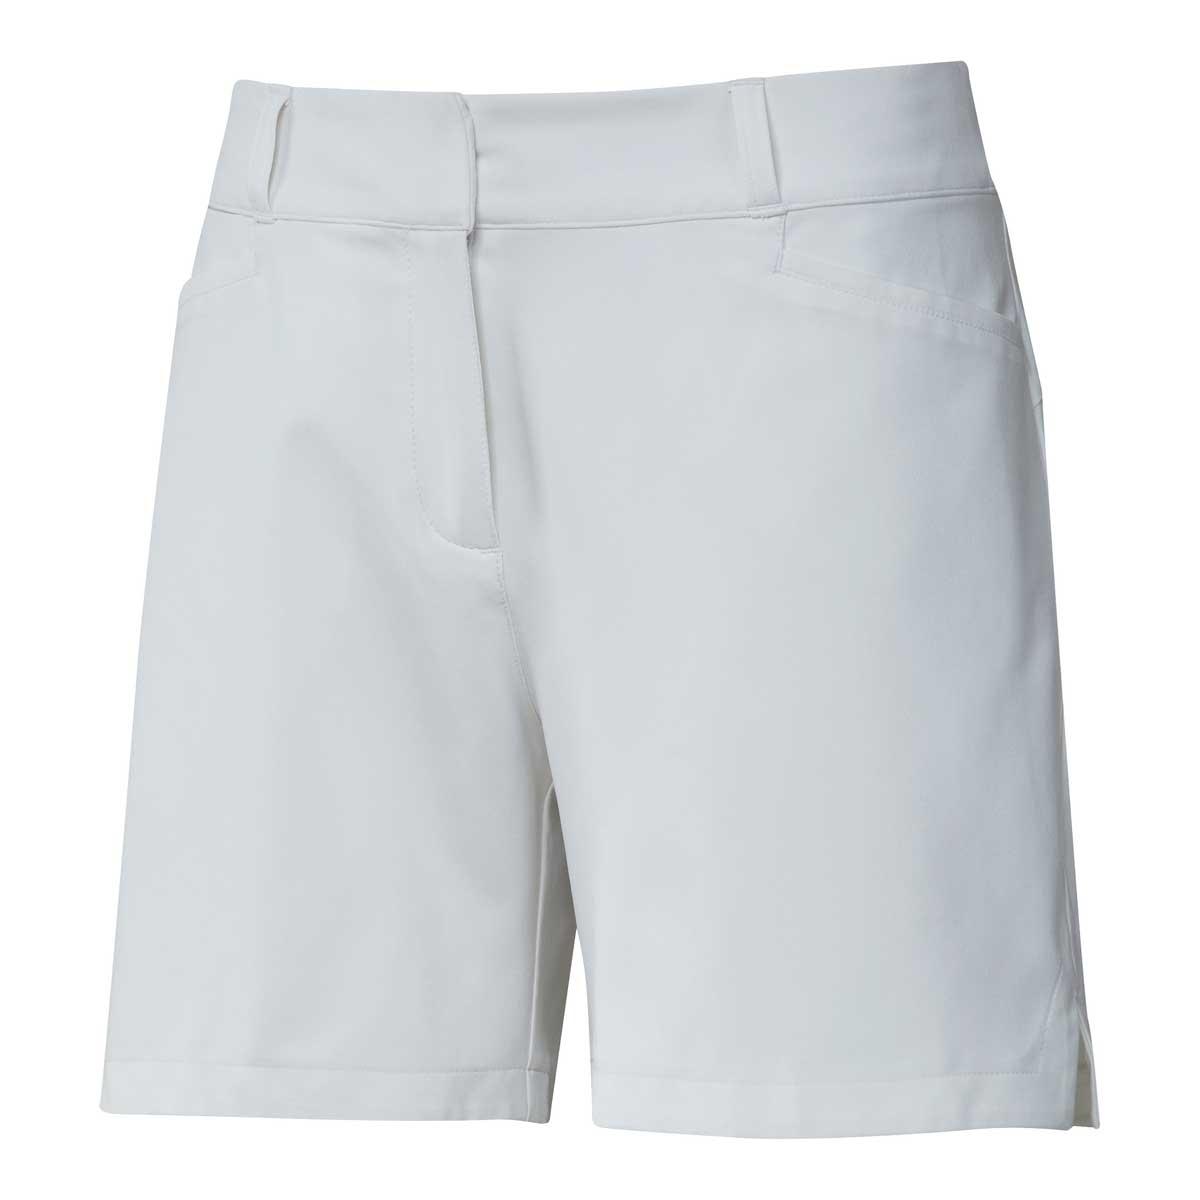 Adidas Women's Solid 5 Inch White Short